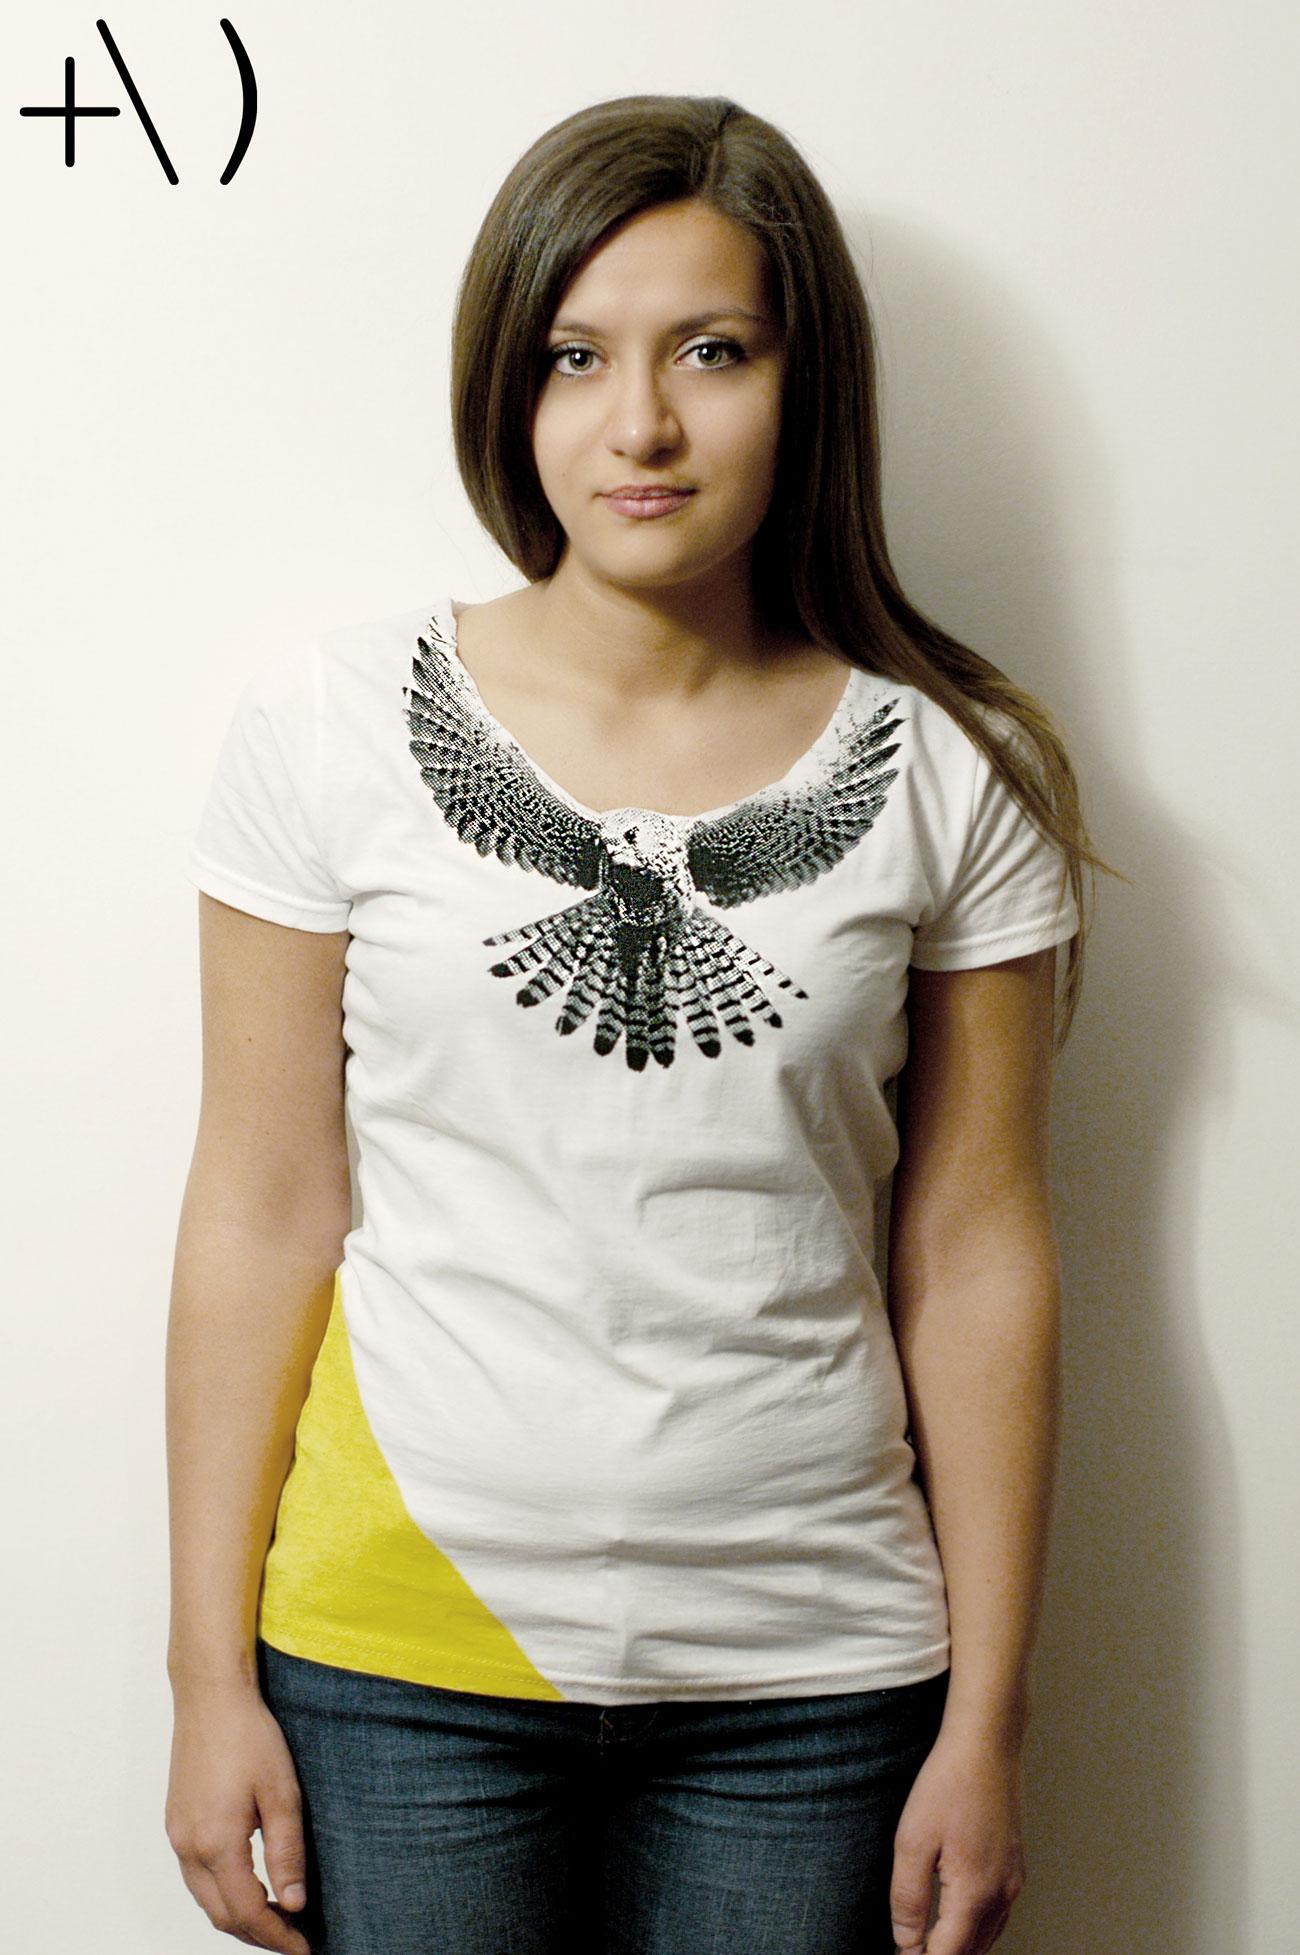 federicus 2015 female t-shirt falco giallo